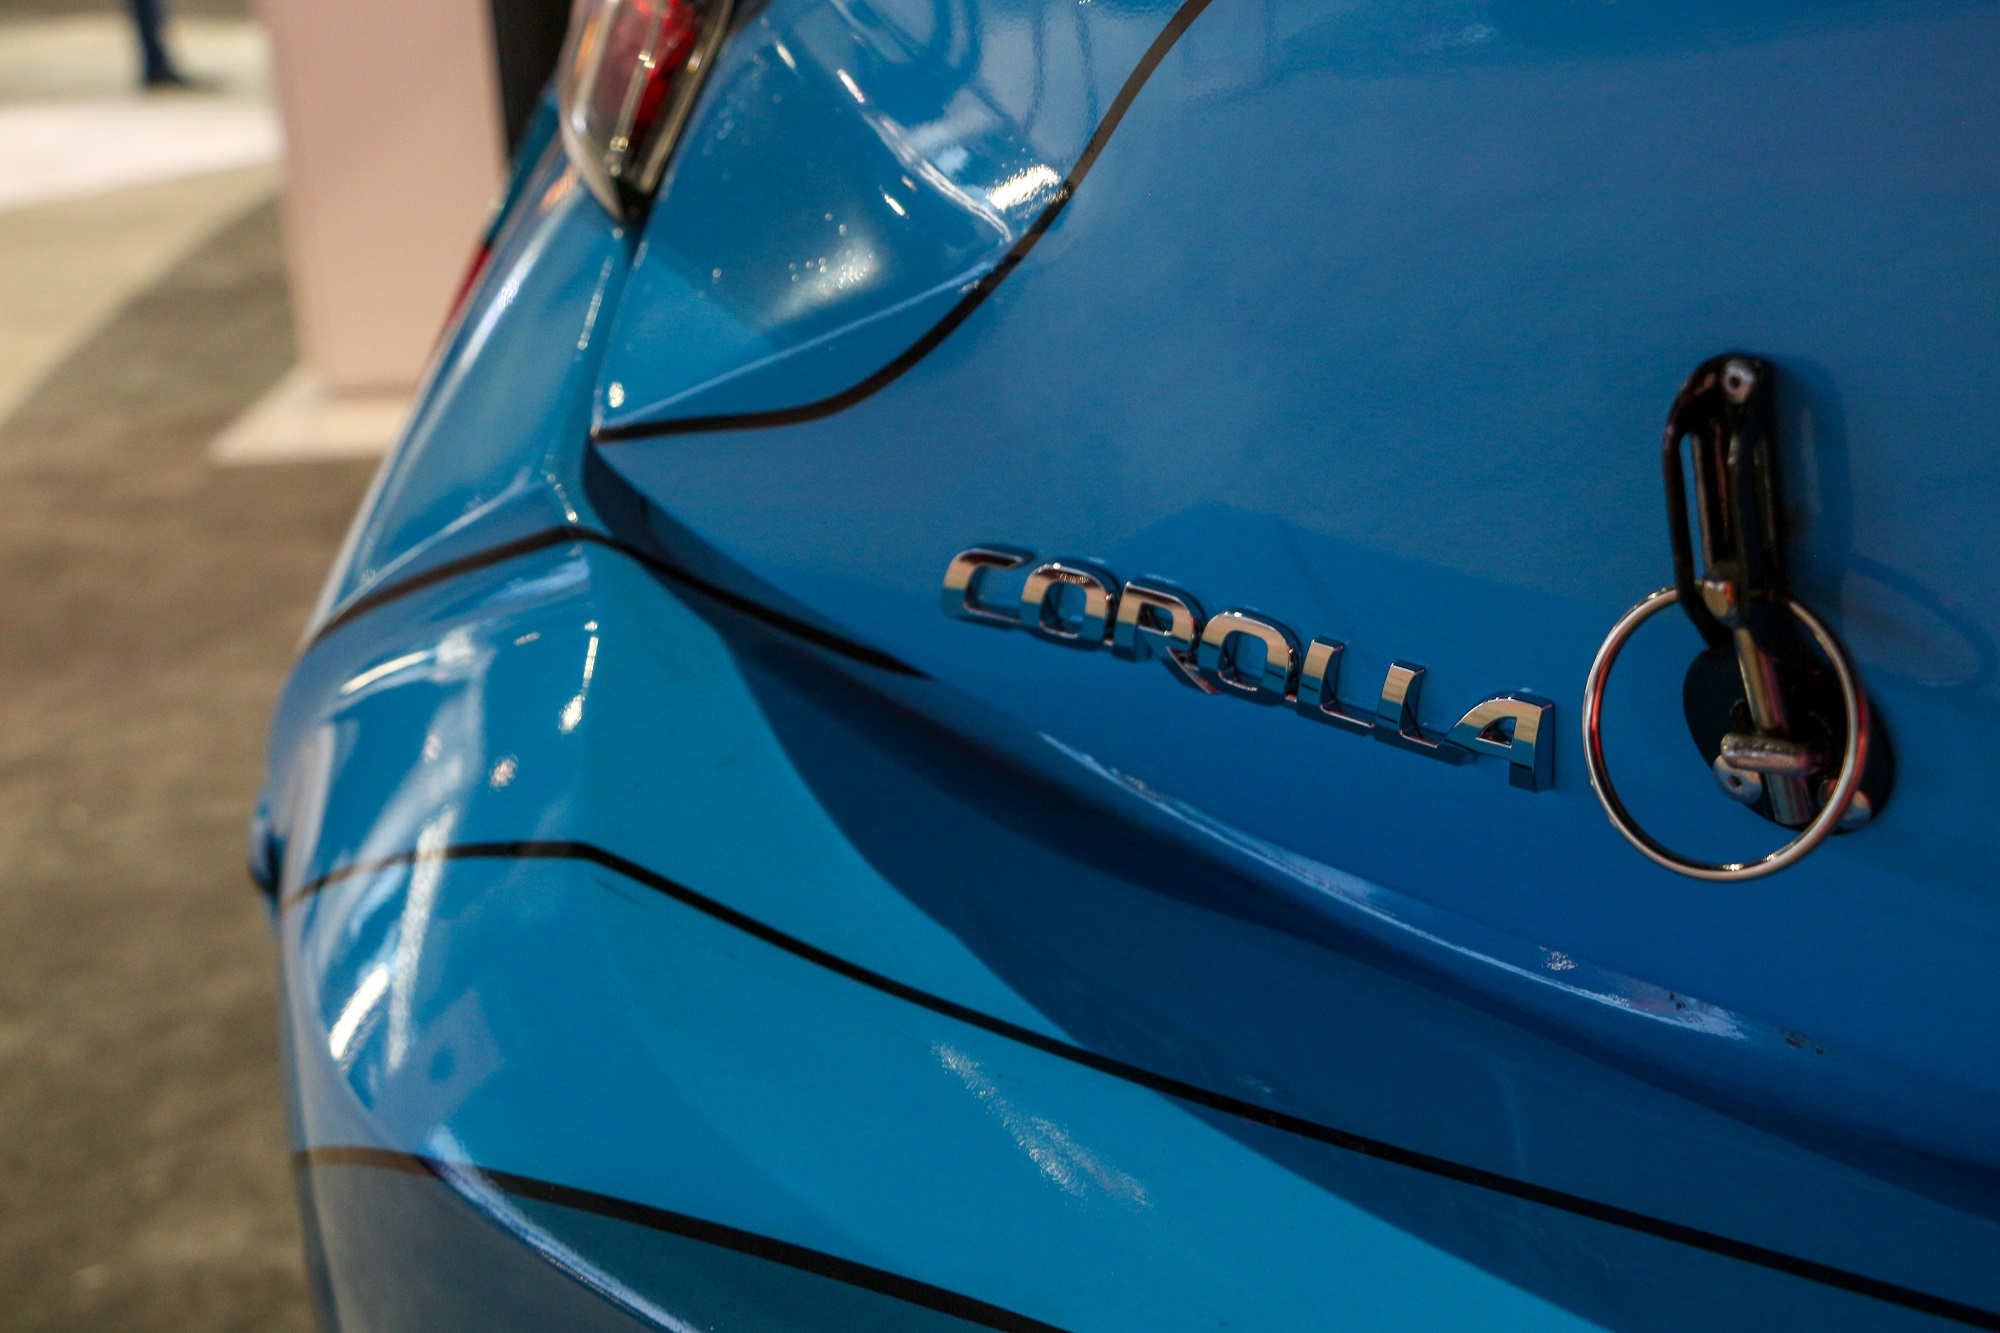 2019 Toyota Corolla Hatchback Fredric Aasbo Formula Drift Demo Car Los Angeles Auto Show